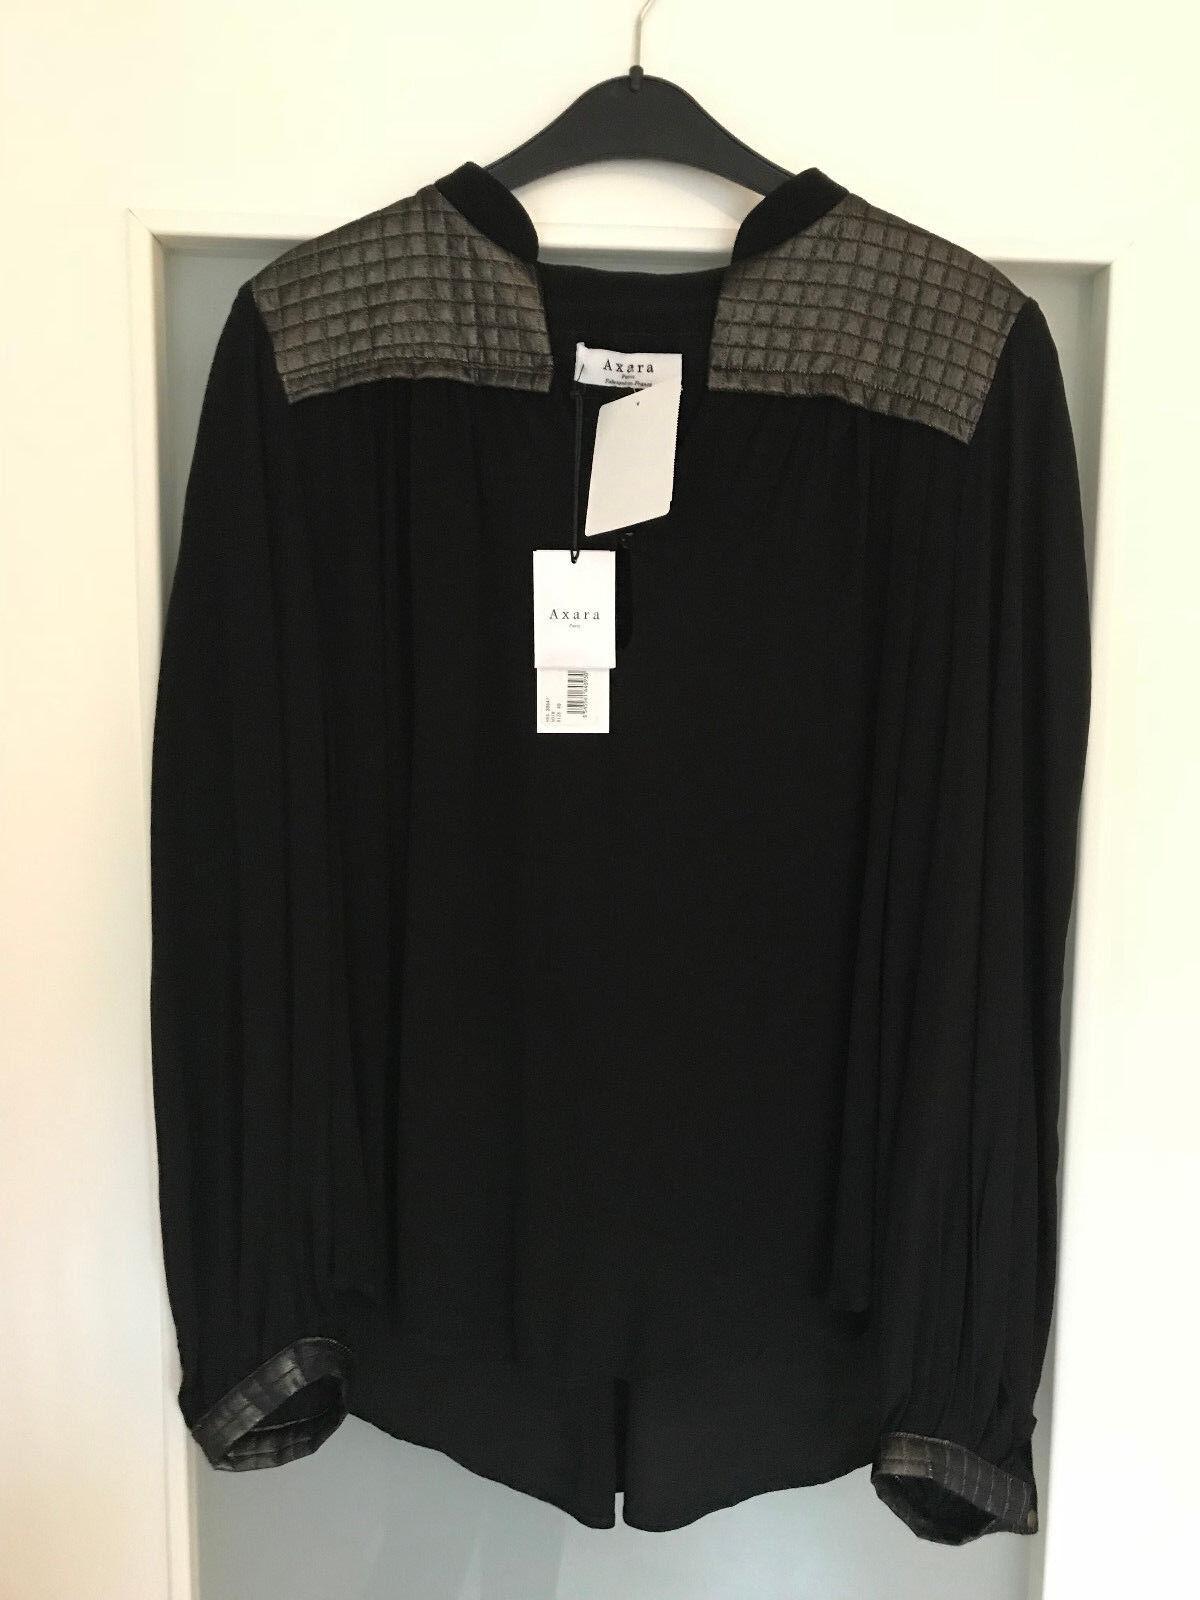 Axara Paris Damen Blause Tunika Gr. 40 schwarz NEU mit Etikett HX4 20641